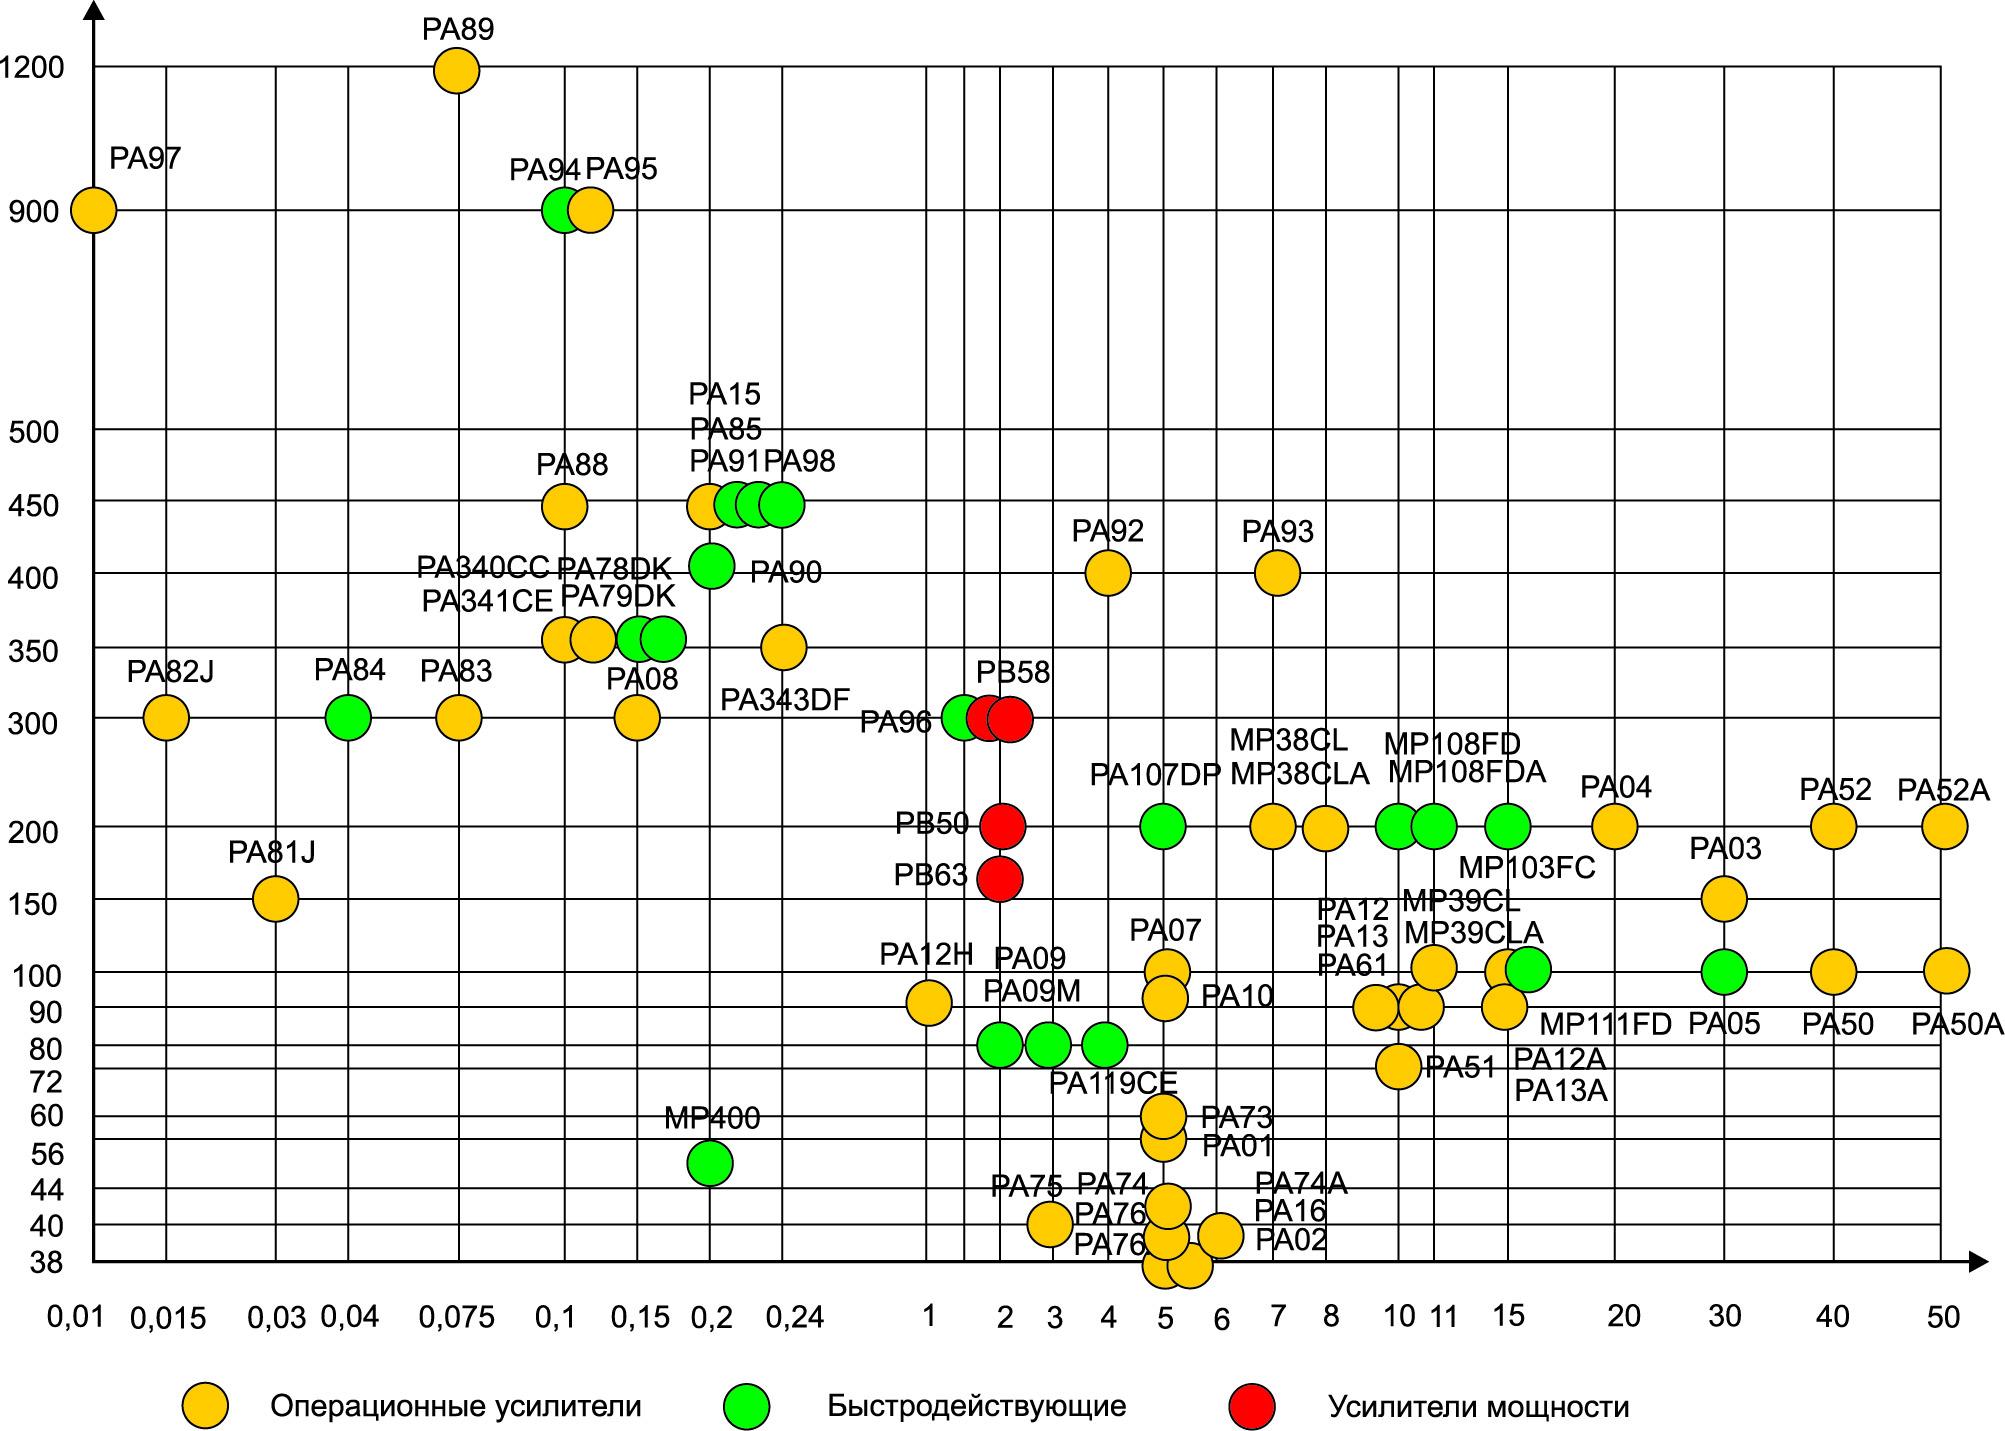 Матрица операционных усилителей Apex Microtechnology